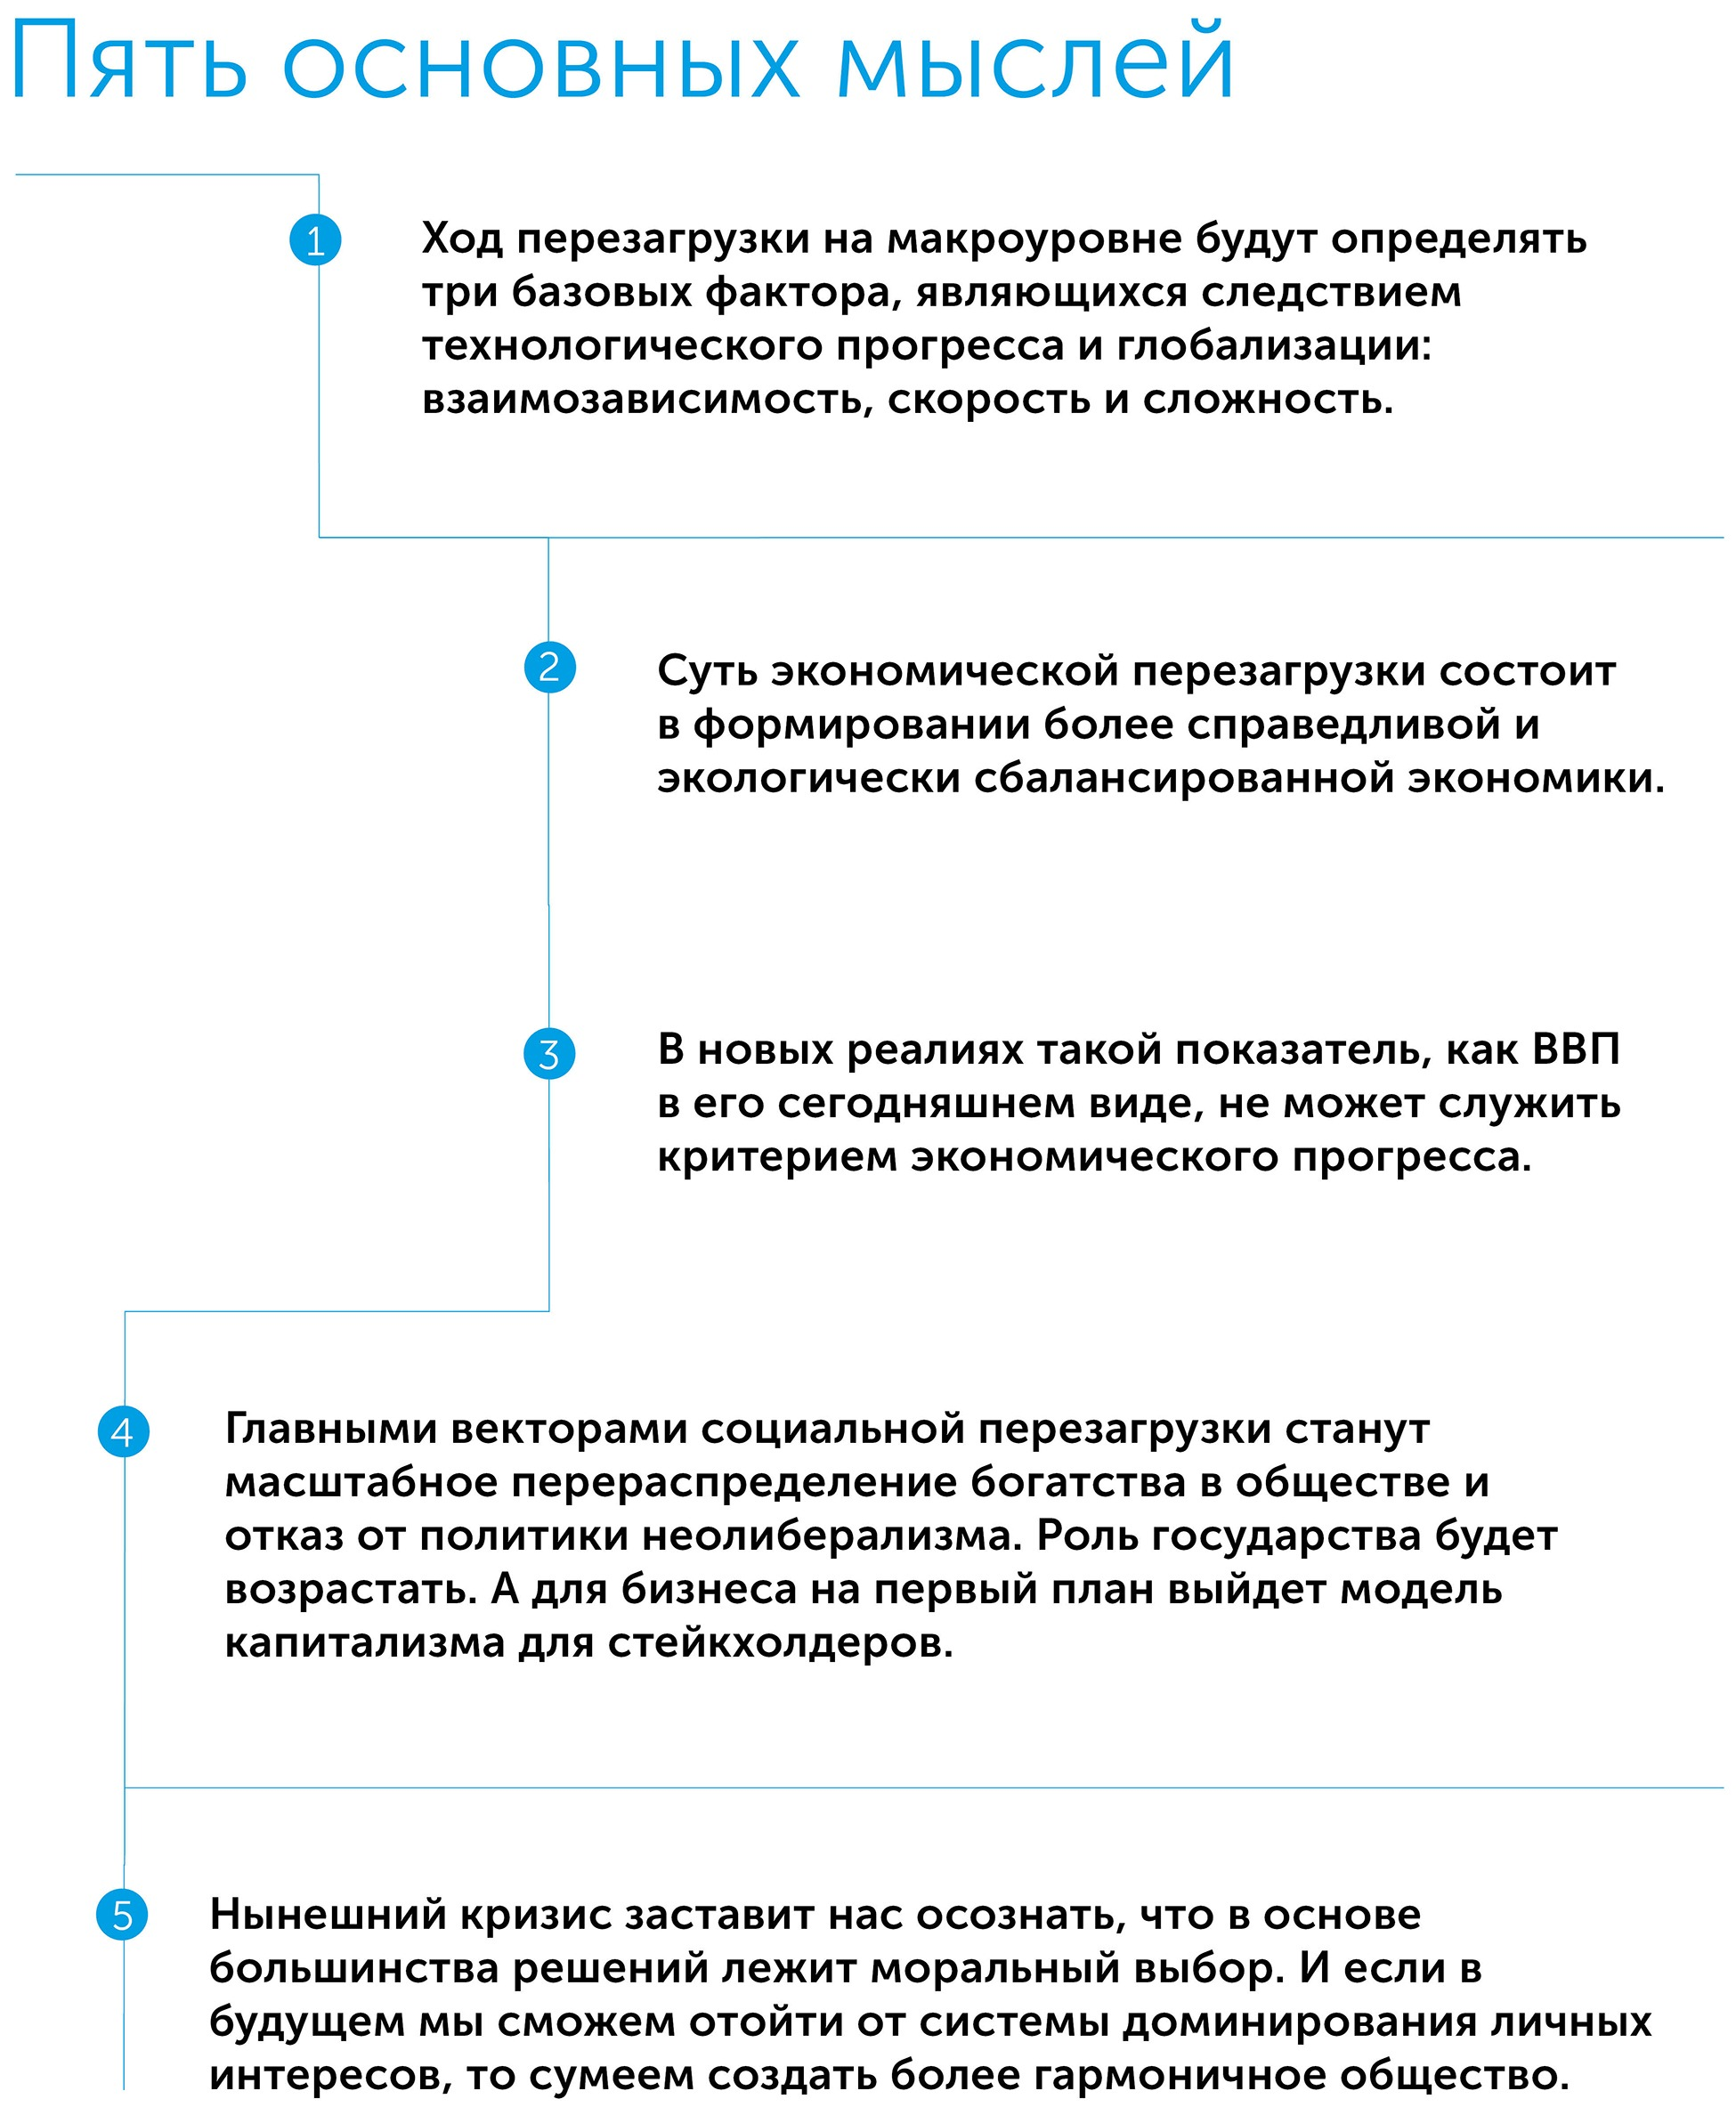 COVID-19, author Клаус Шваб   Kyivstar Business Hub, image №2